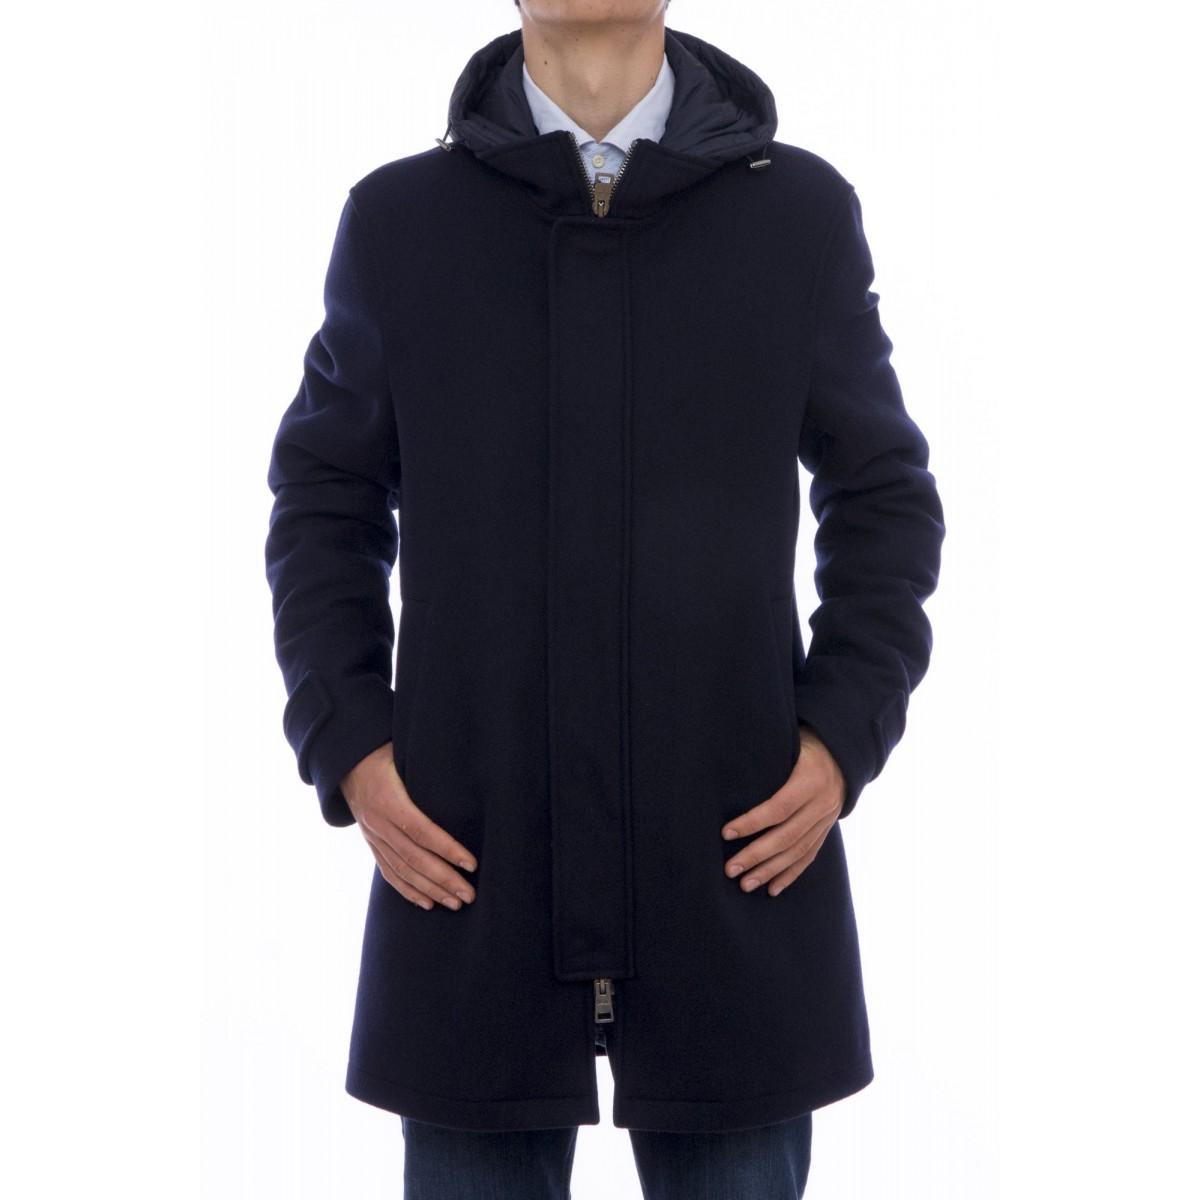 Piumino Herno - PI0332U 39601 cappotto lana diagonale + nylon chamonix